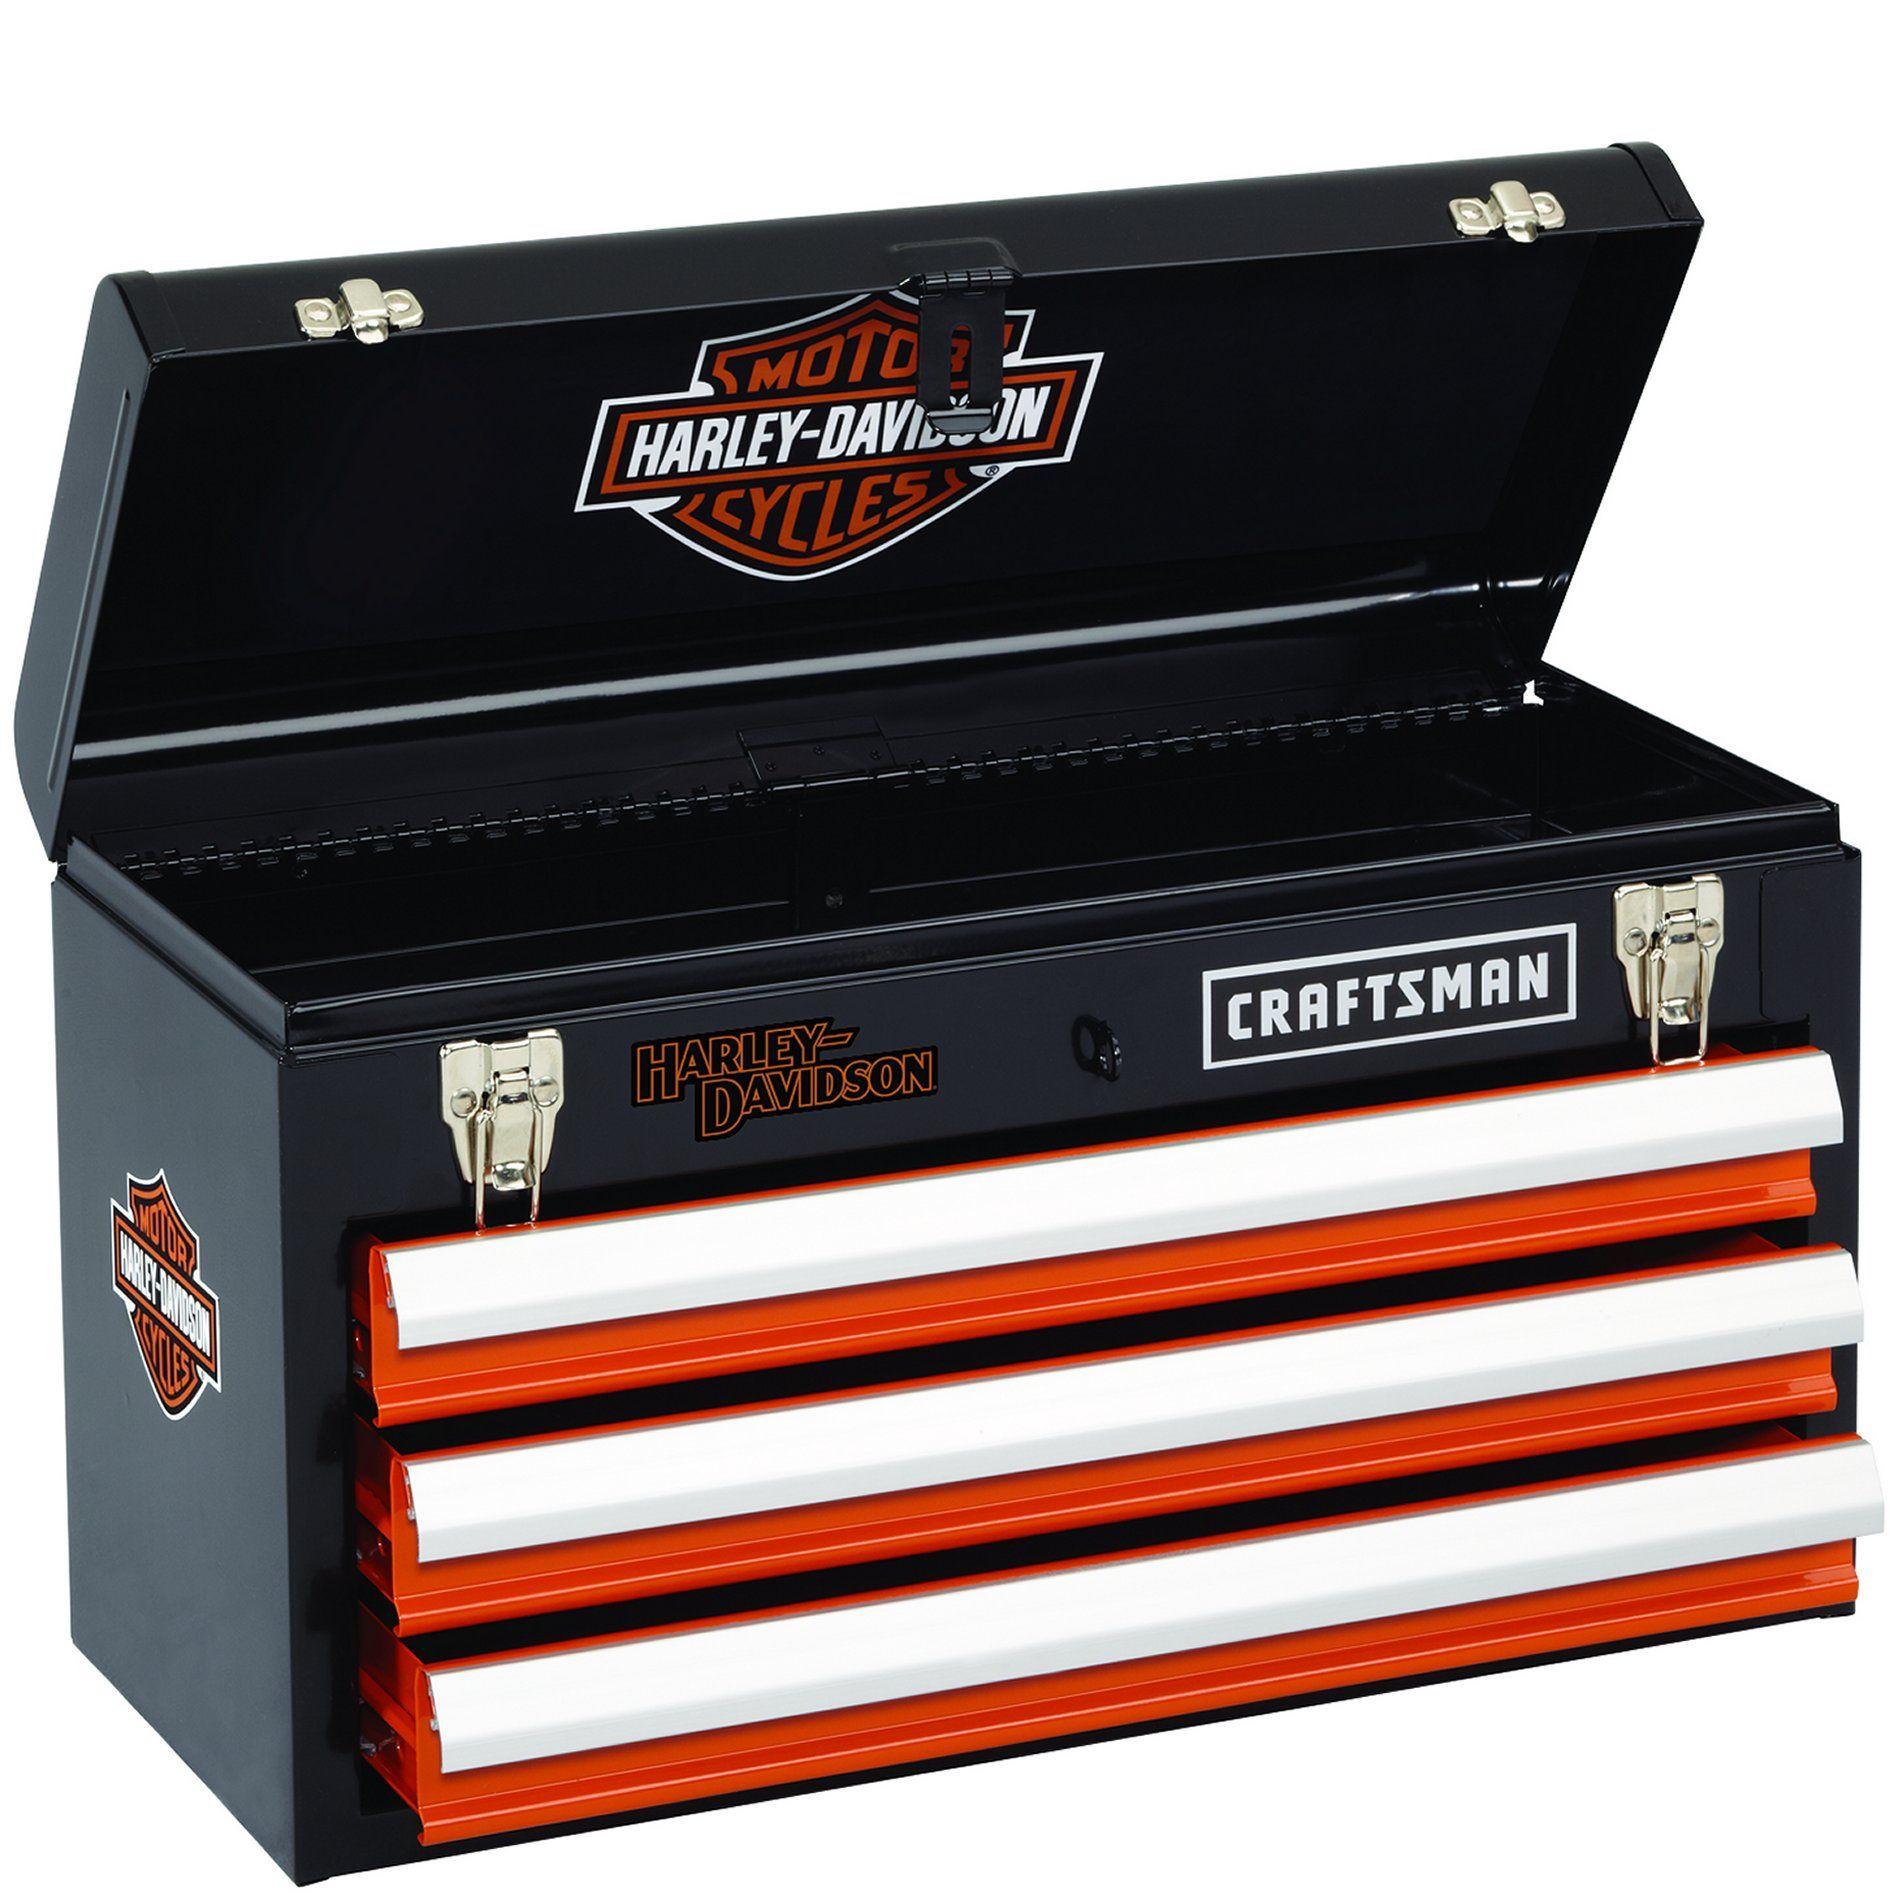 Harley davidson · product · Tool Box ...  sc 1 st  Pinterest & product | My Christmas list | Pinterest | Harley davidson